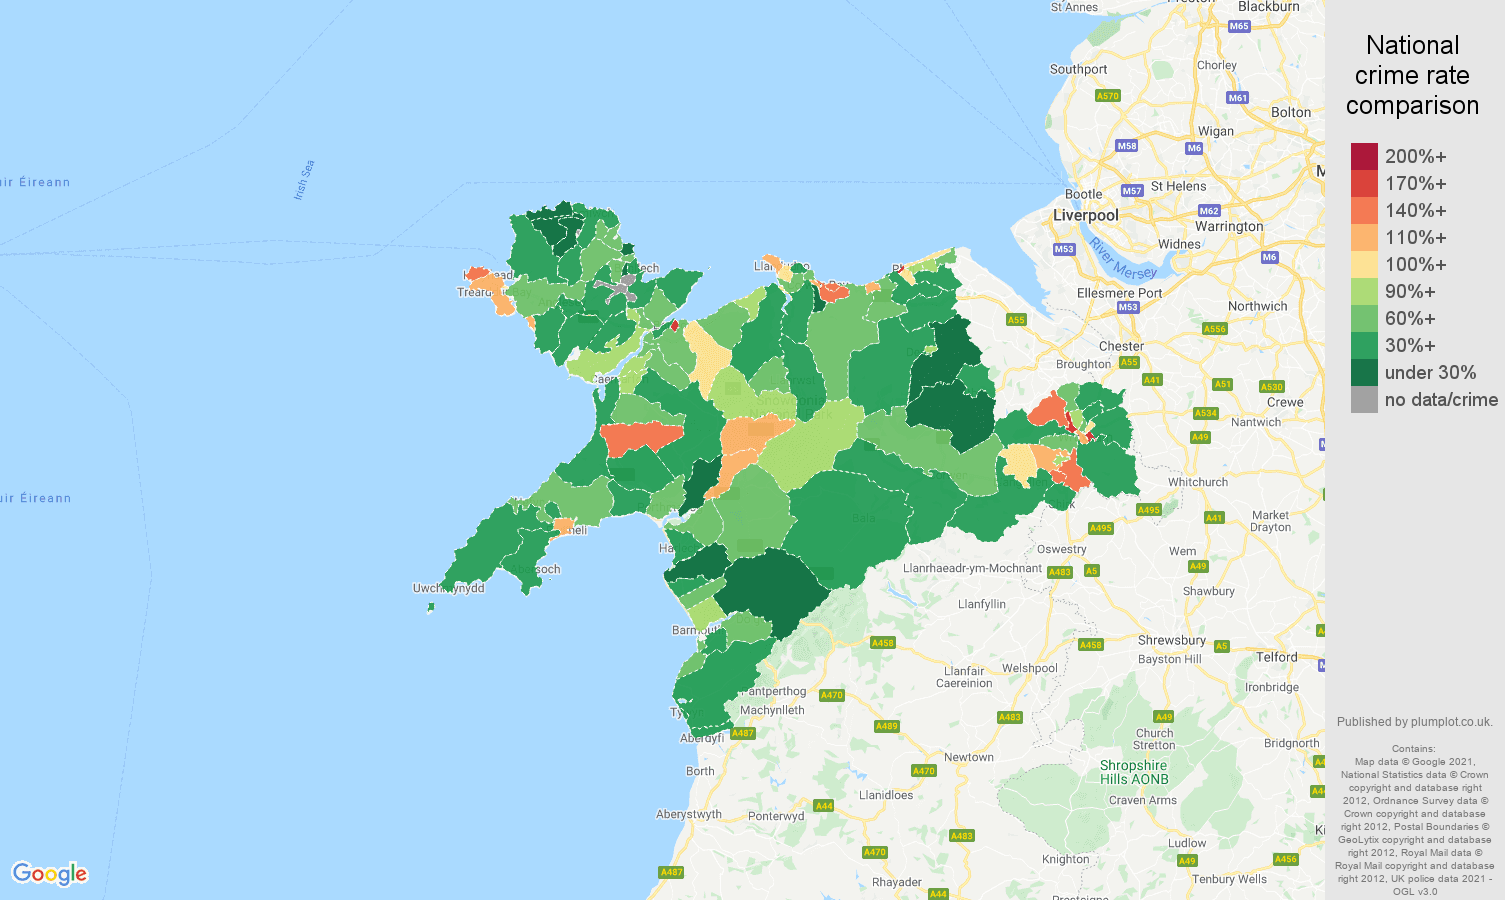 Llandudno antisocial behaviour crime rate comparison map